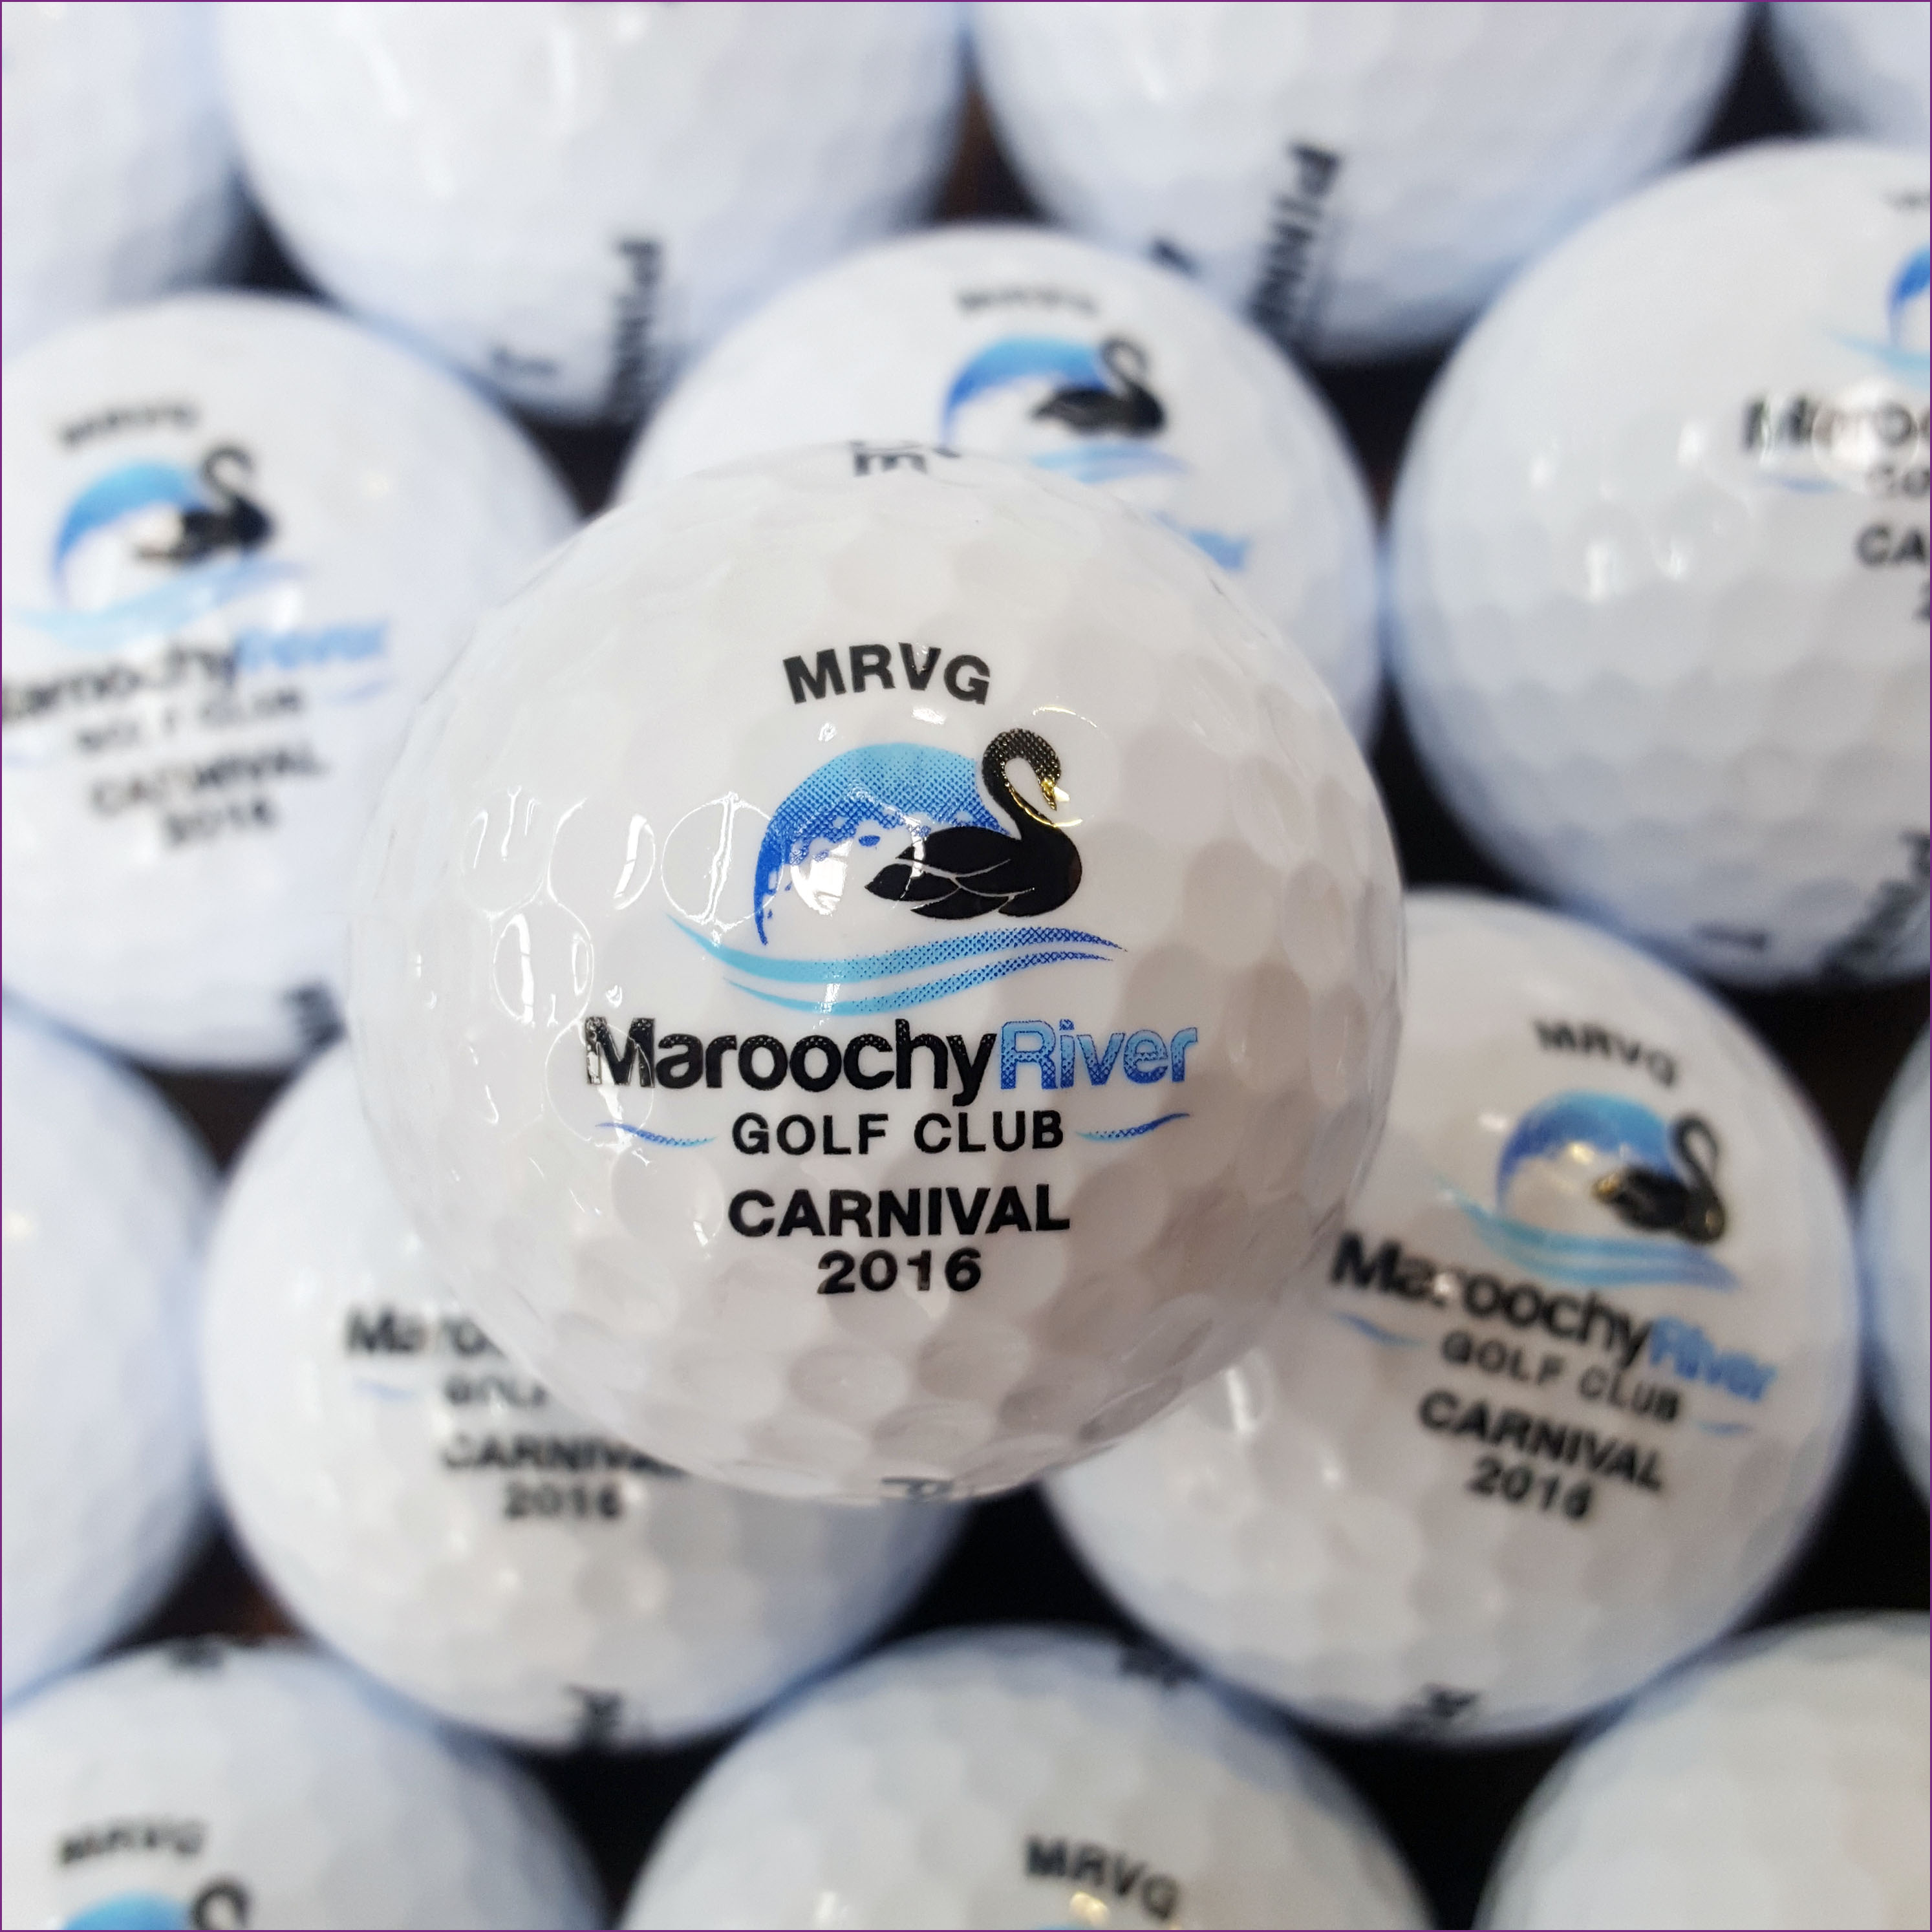 Pad printing on golf balls